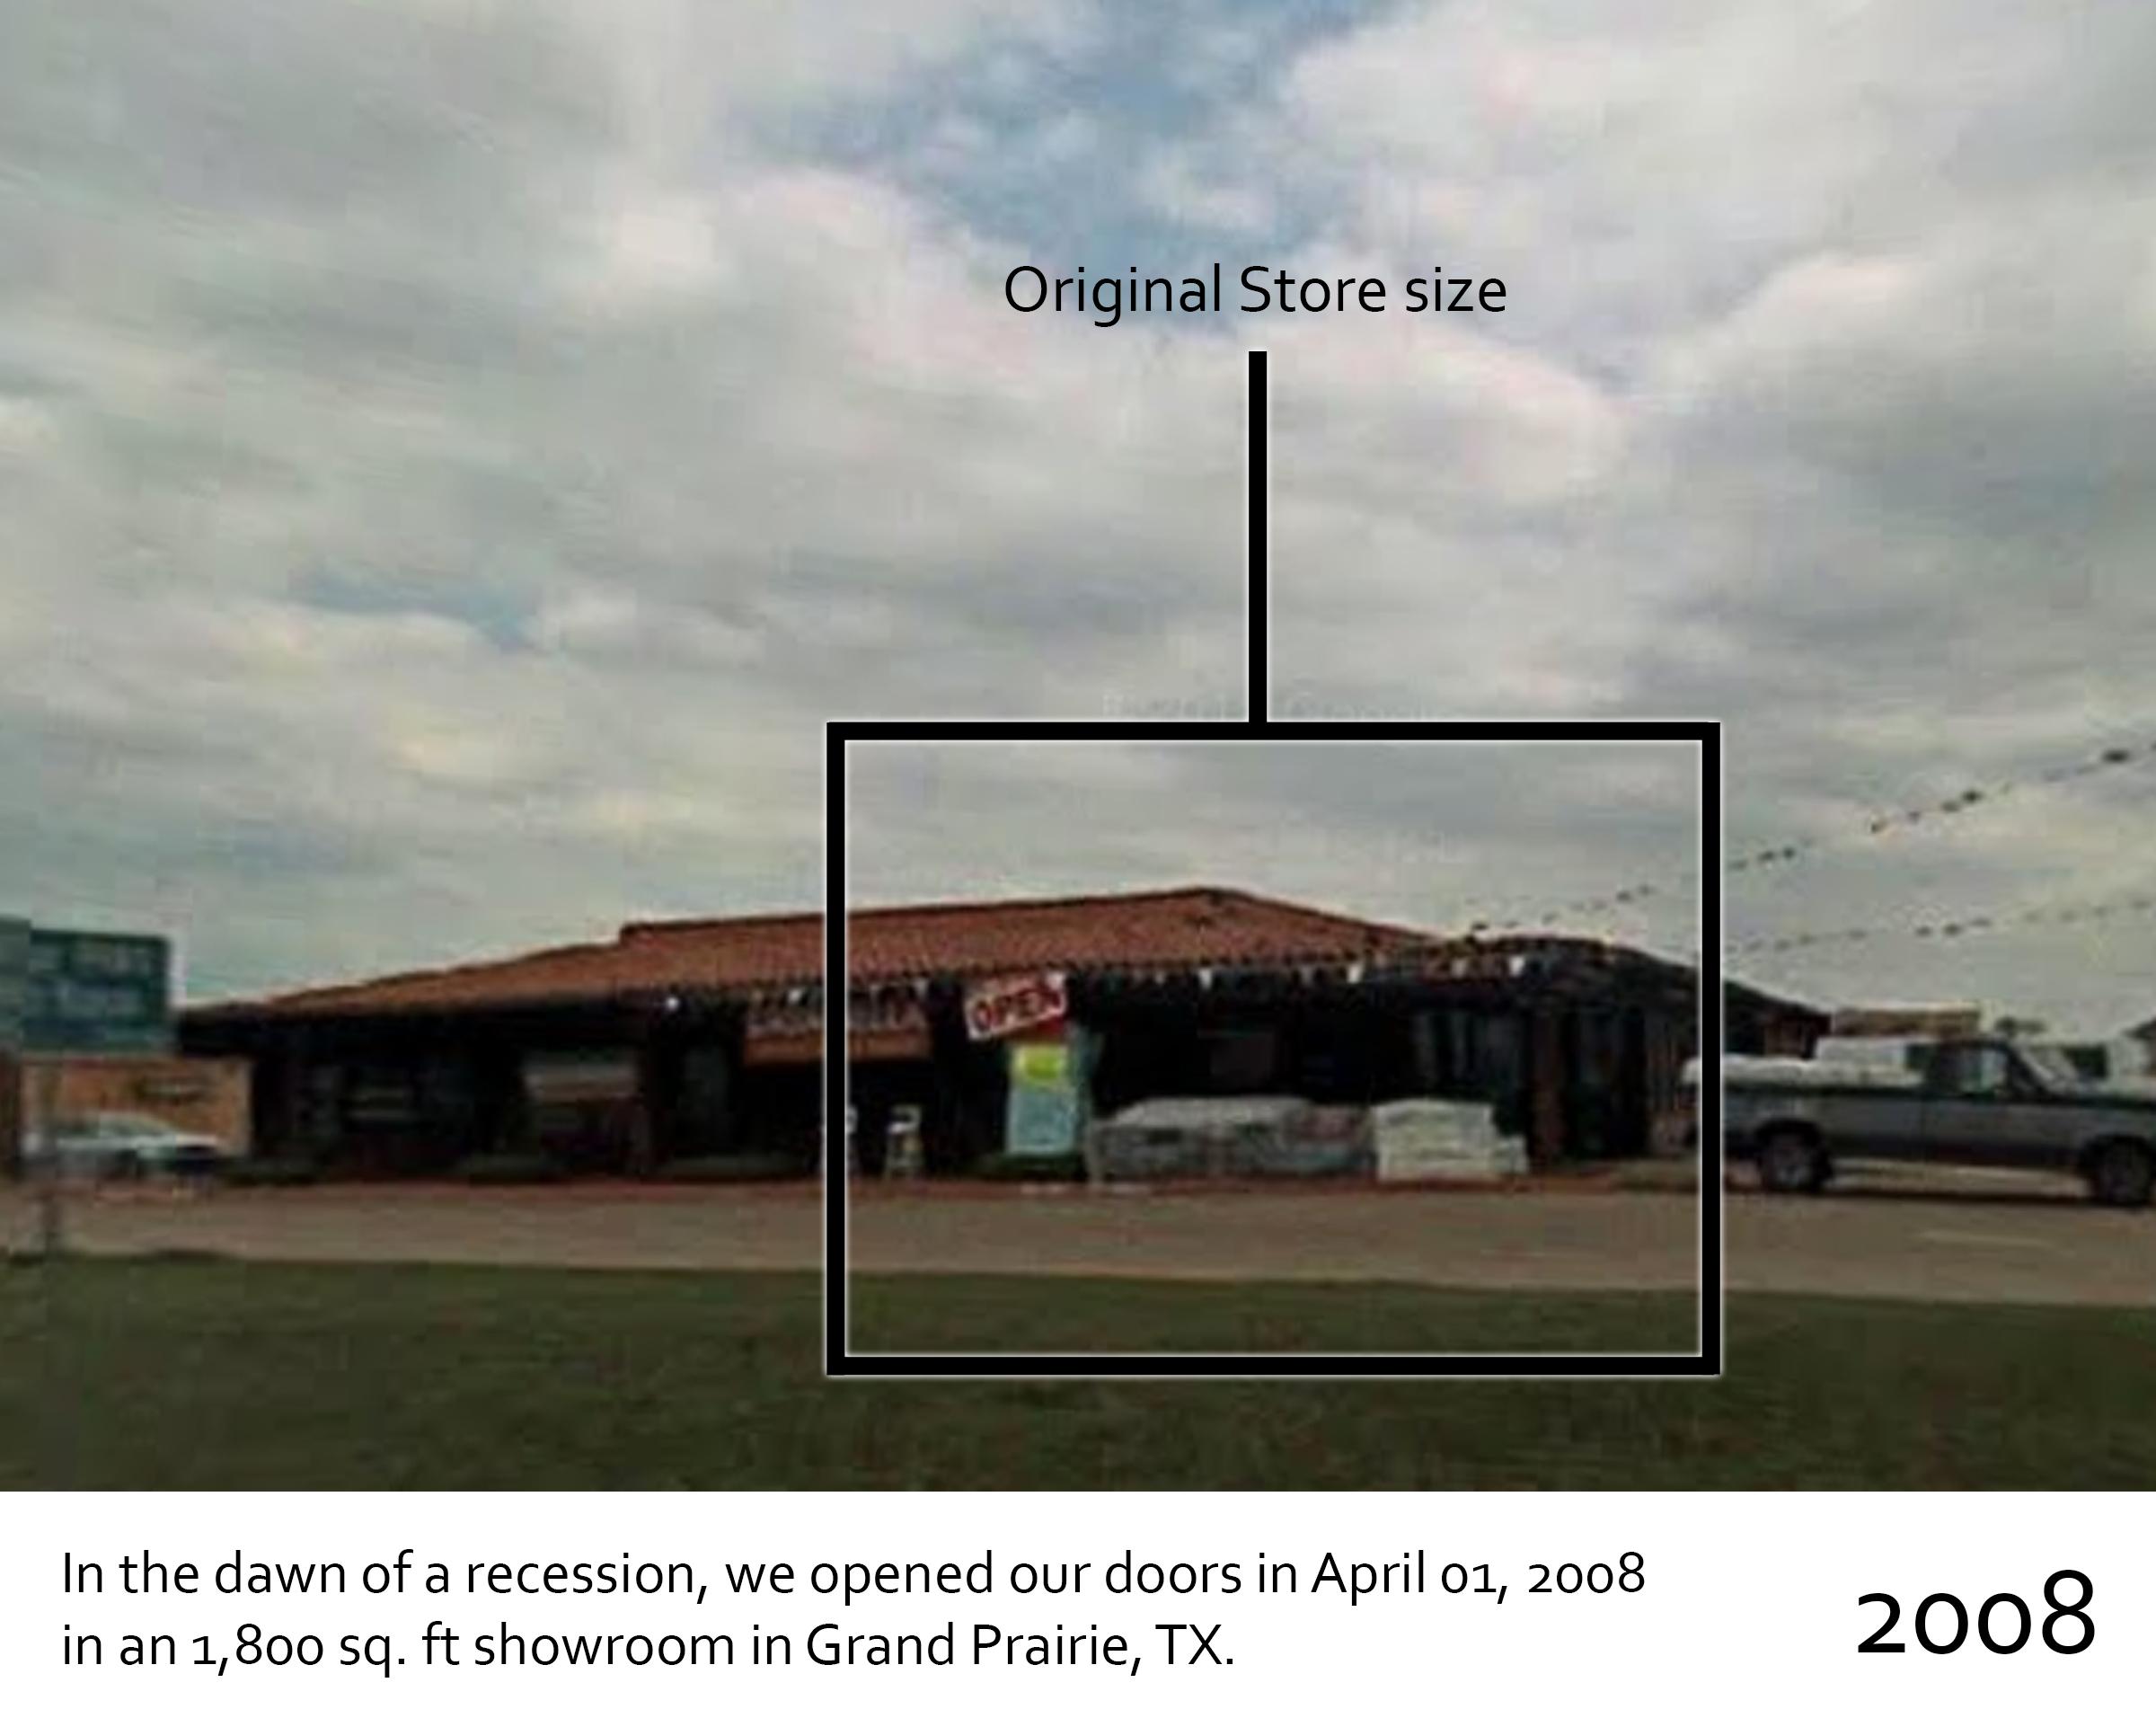 history-original-size.jpg